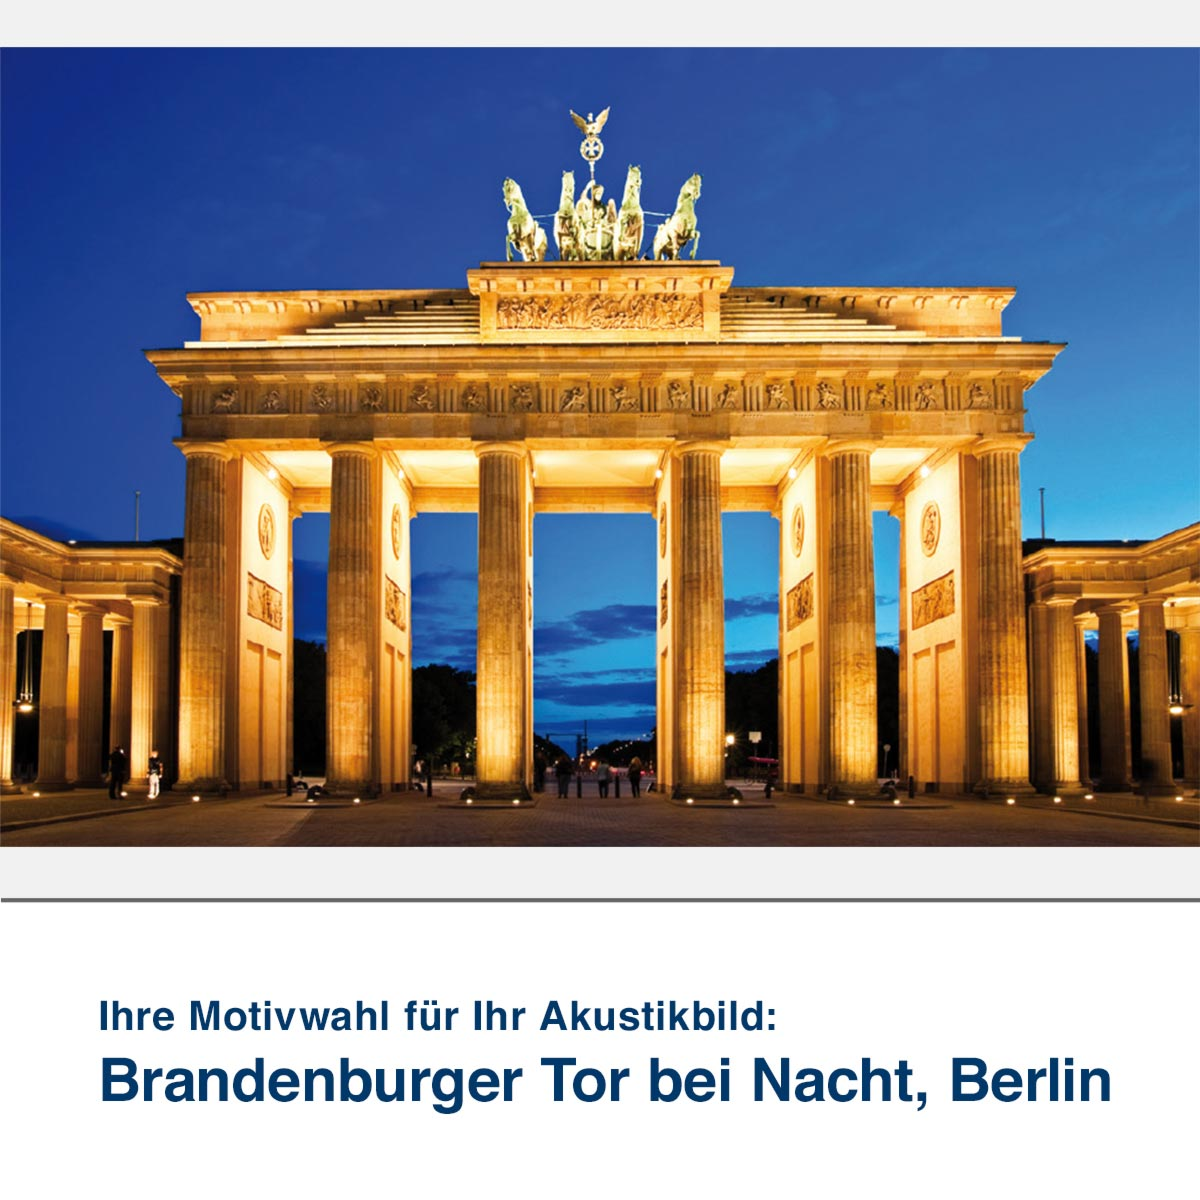 Akustikbild Motiv Brandenburger Tor bei Nacht, Berlin